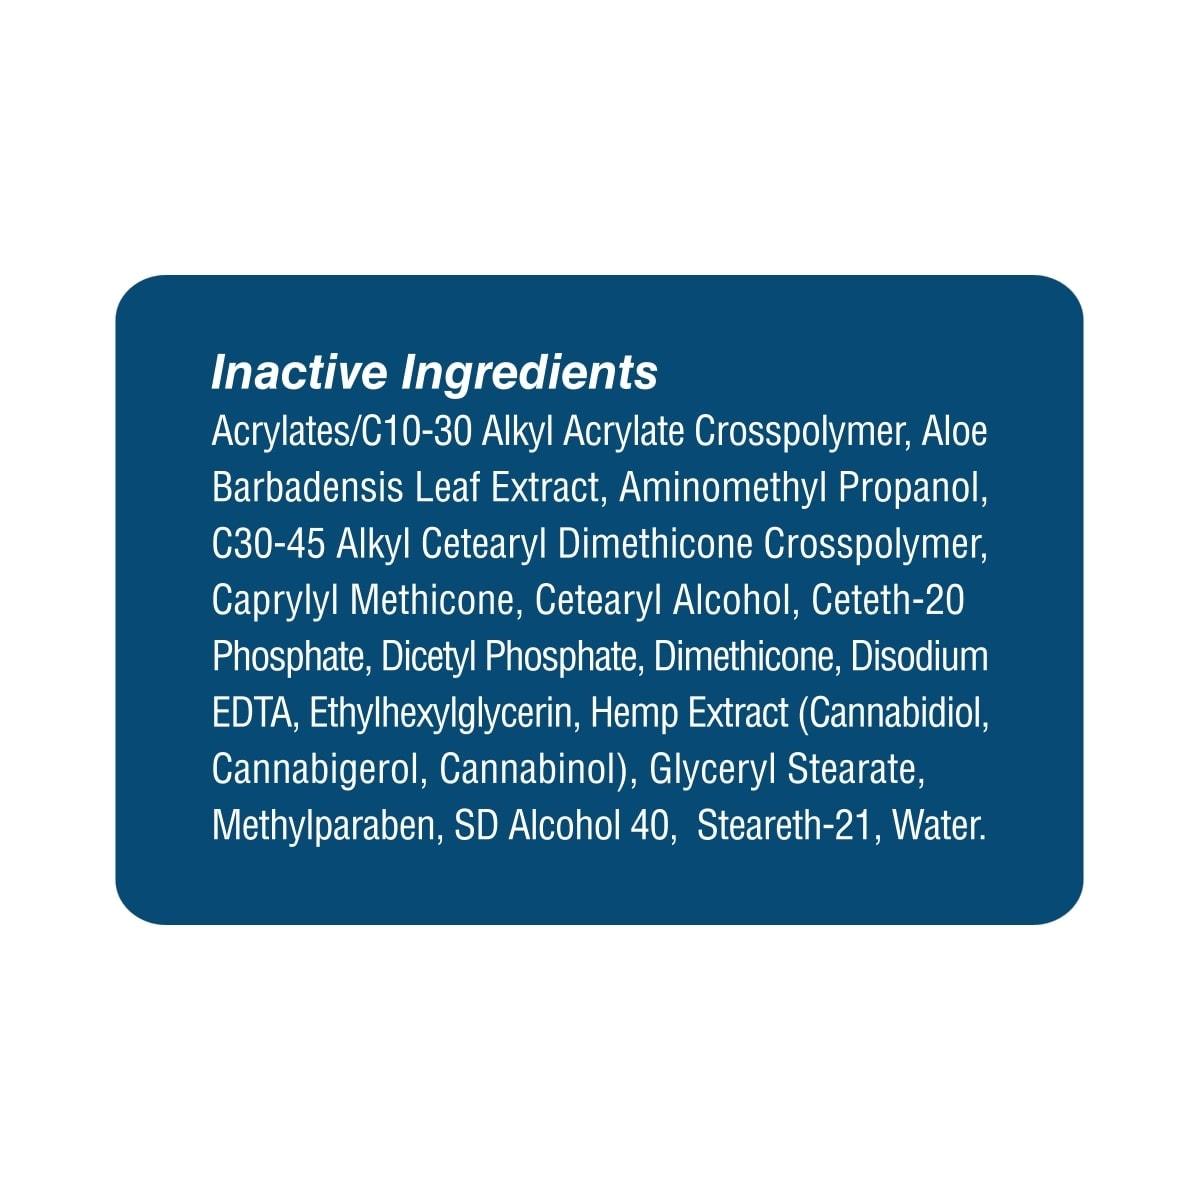 cbdMD, CBD Lidocaine Spray, Broad Spectrum THC-Free, 4oz, 1500mg of CBD4